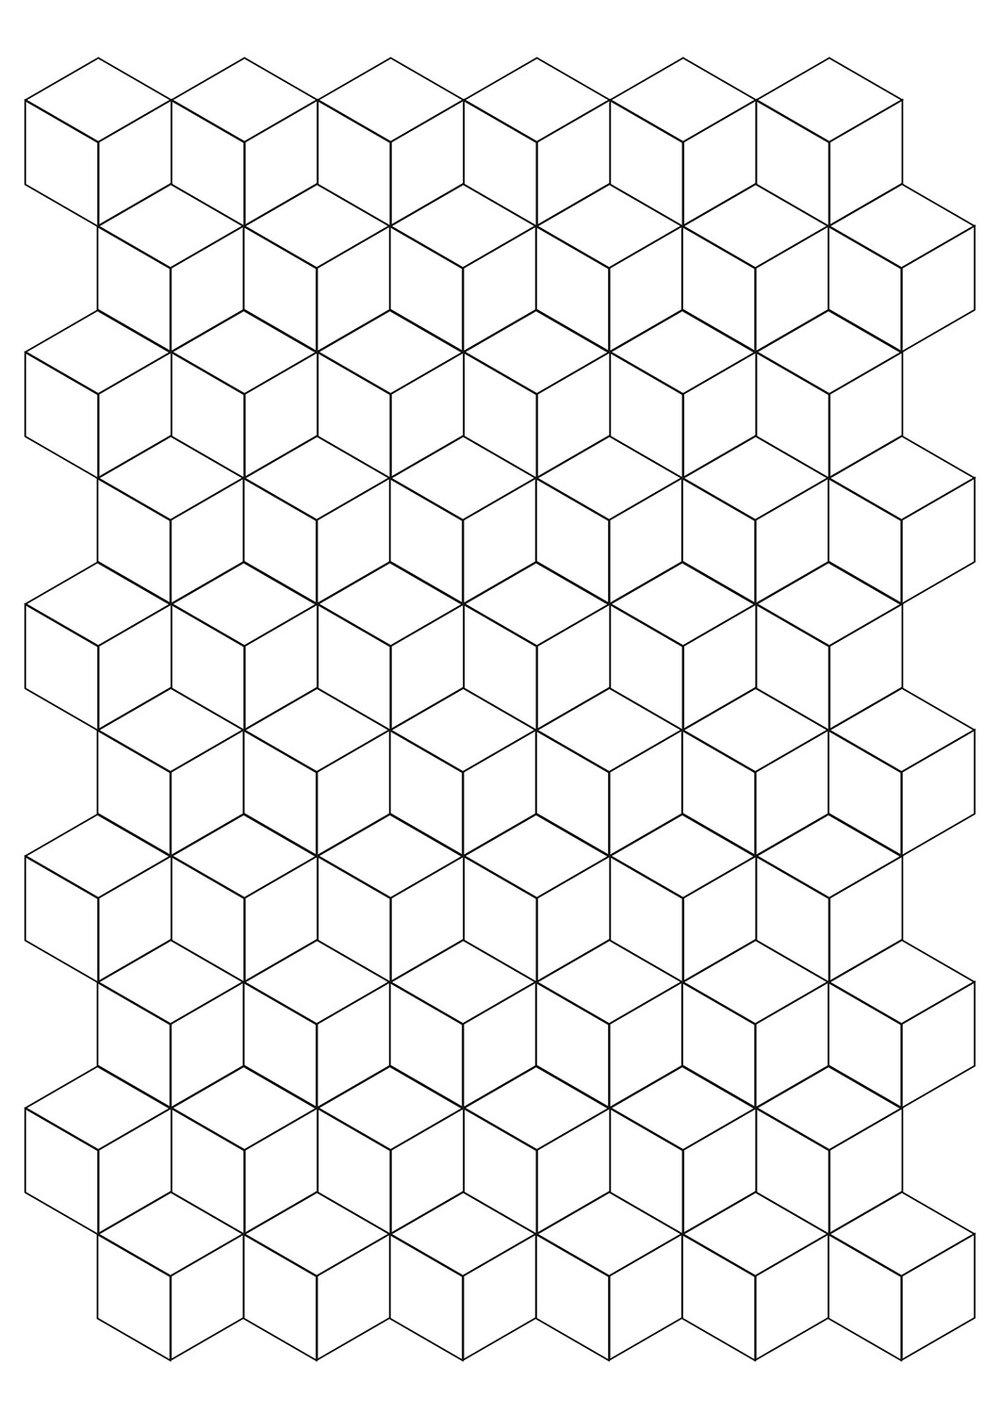 pattern01 14.jpg